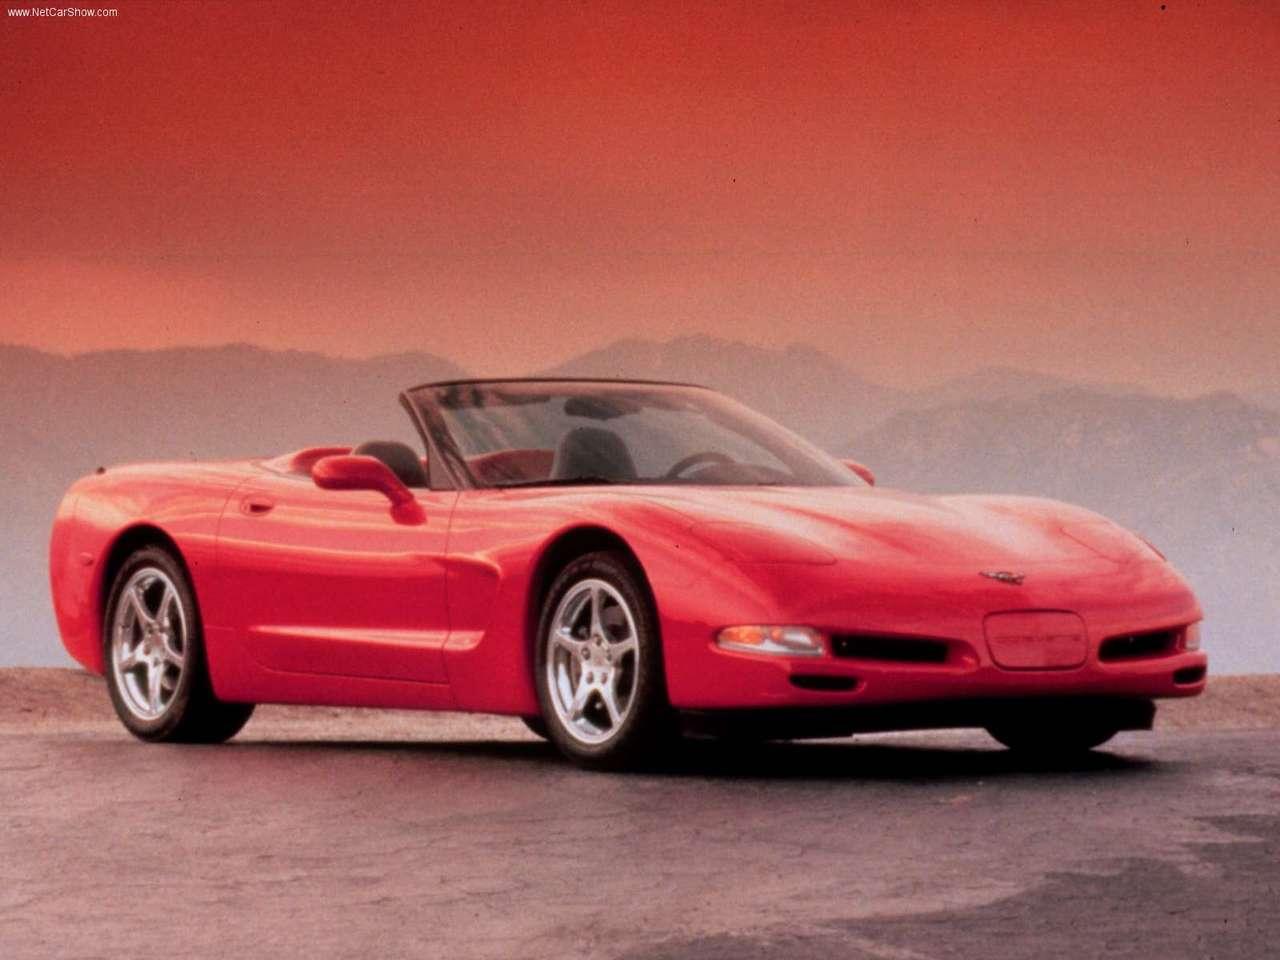 http://4.bp.blogspot.com/-9H5S0BhHRZ4/TZBWCY3sfrI/AAAAAAAAOKo/E63YN__48E0/s1600/Chevrolet-Corvette_2000_1280x960_wallpaper_01.jpg